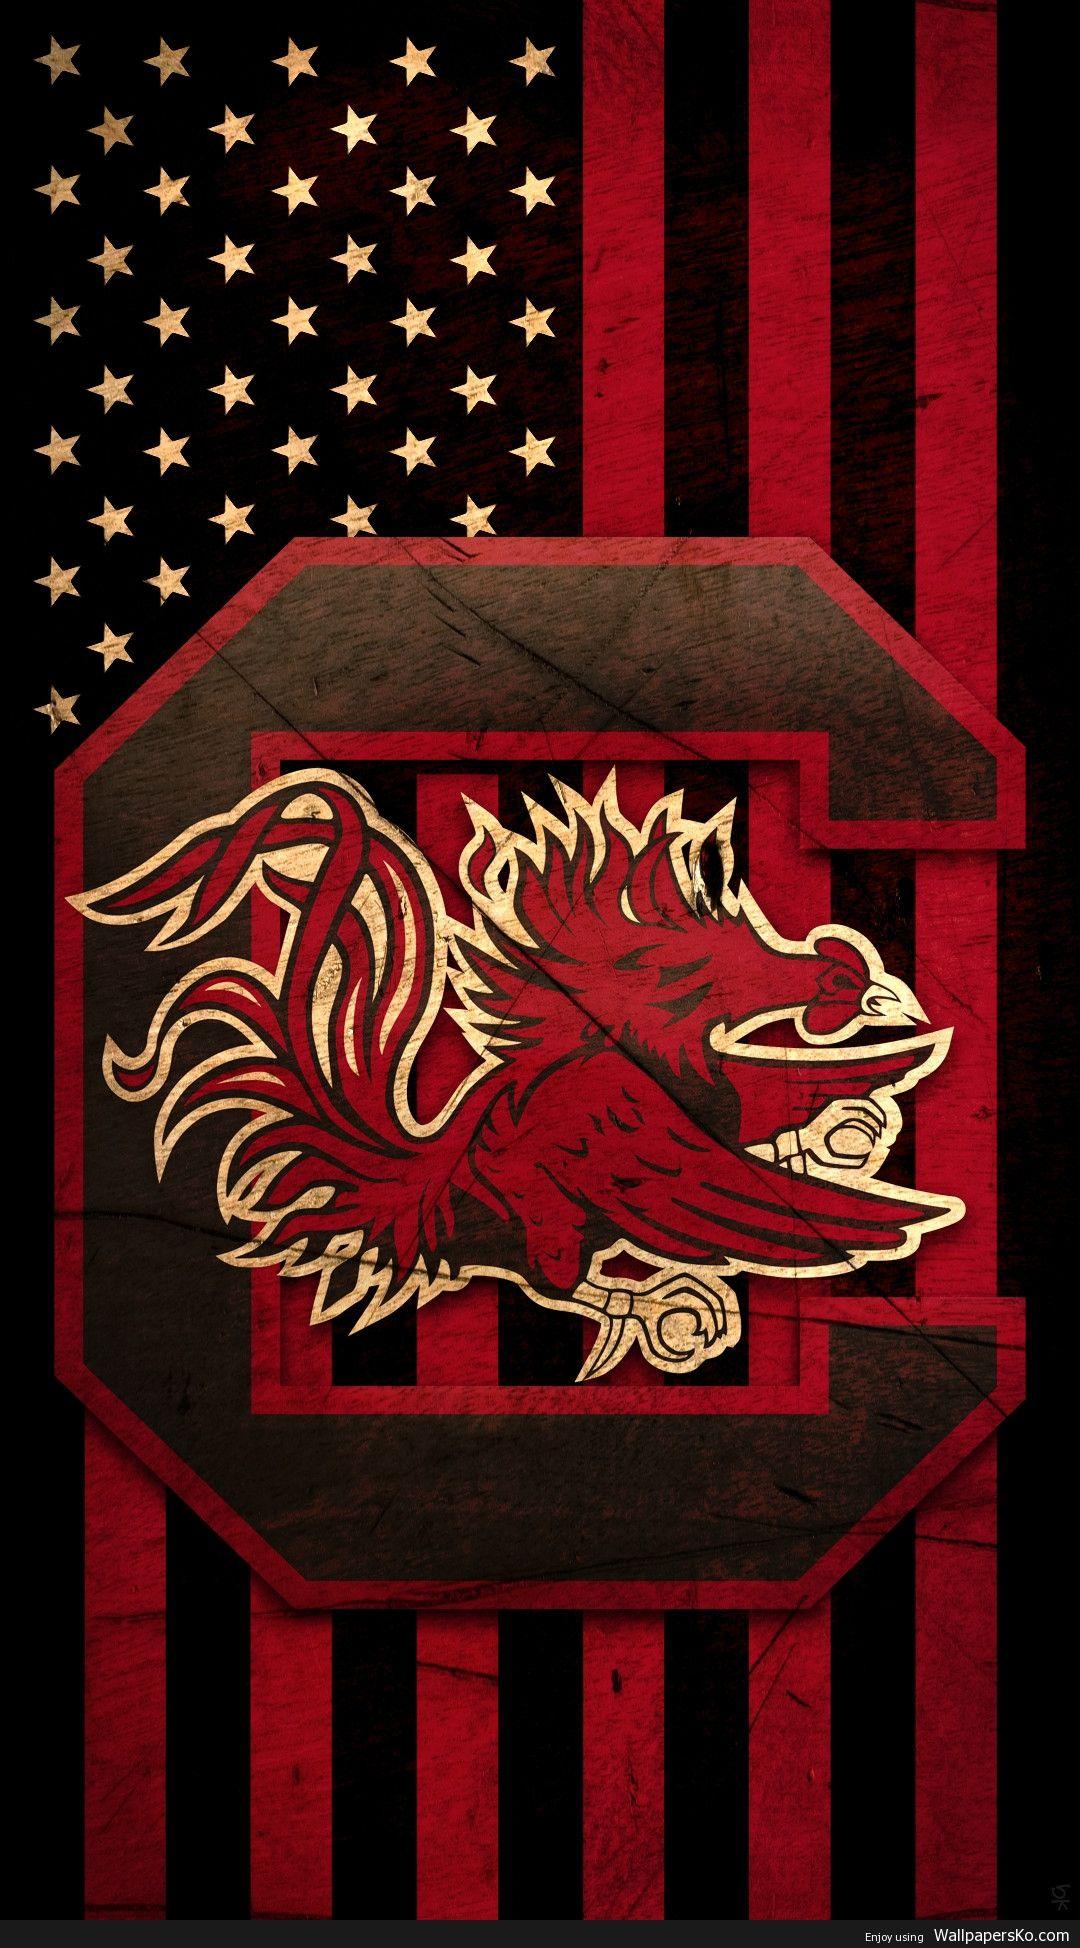 Gamecock Wallpaper For Iphone Http Wallpapersko Com Gamecock Wallpaper For Iphone Html Hd Wallpapers Downl Gamecocks South Carolina Gamecocks Go Gamecocks